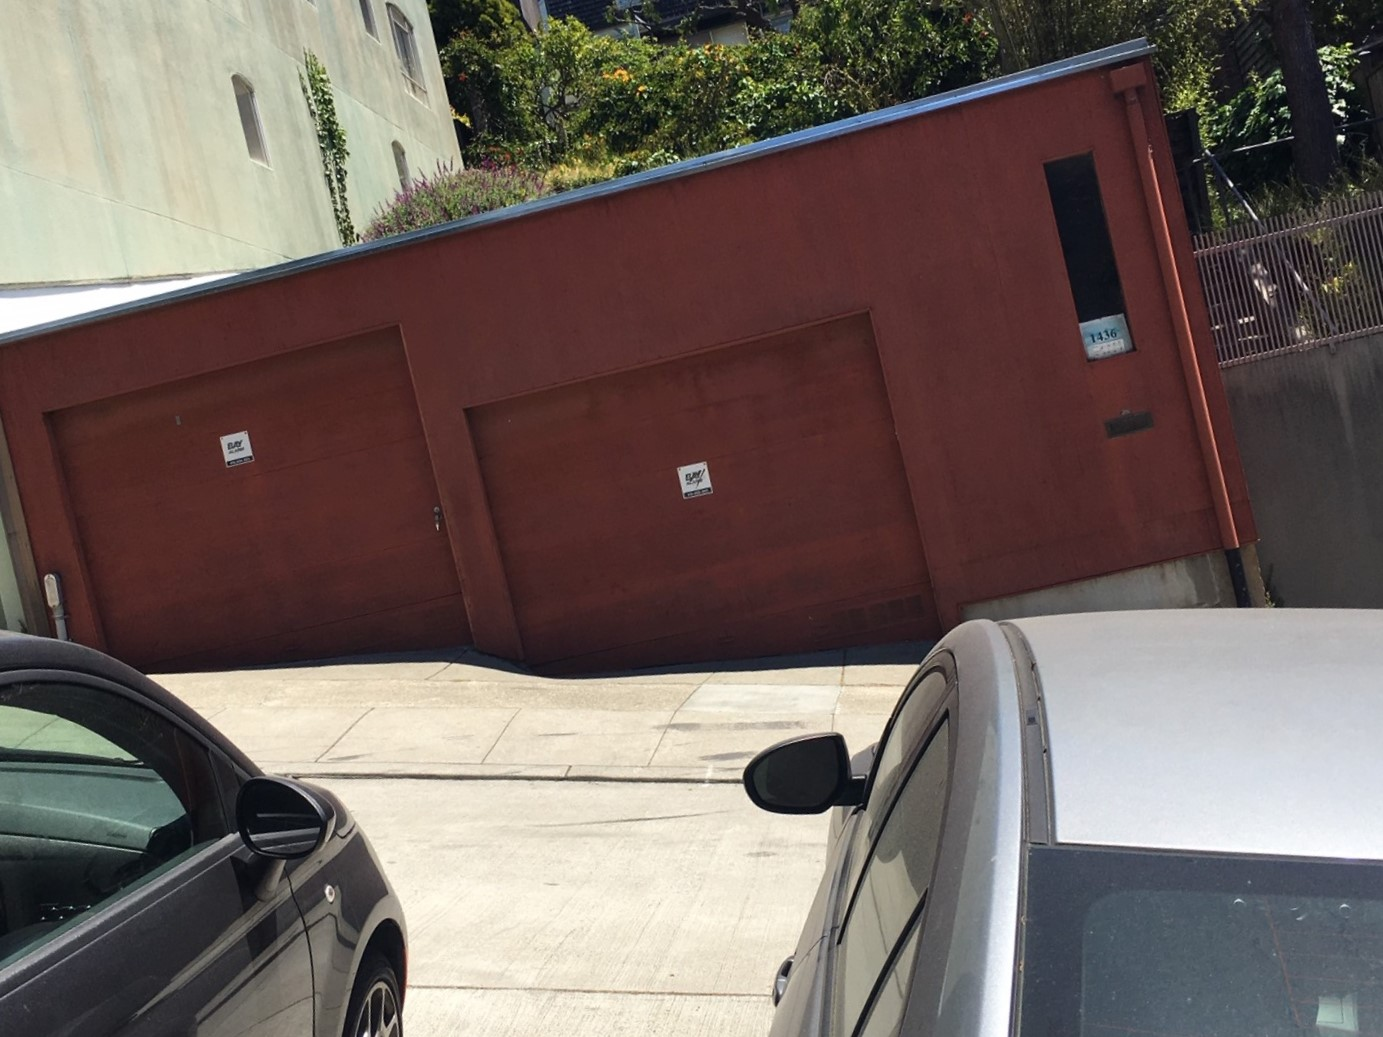 You are currently viewing [Effet d'optique?] Dans les rues de San Francisco…